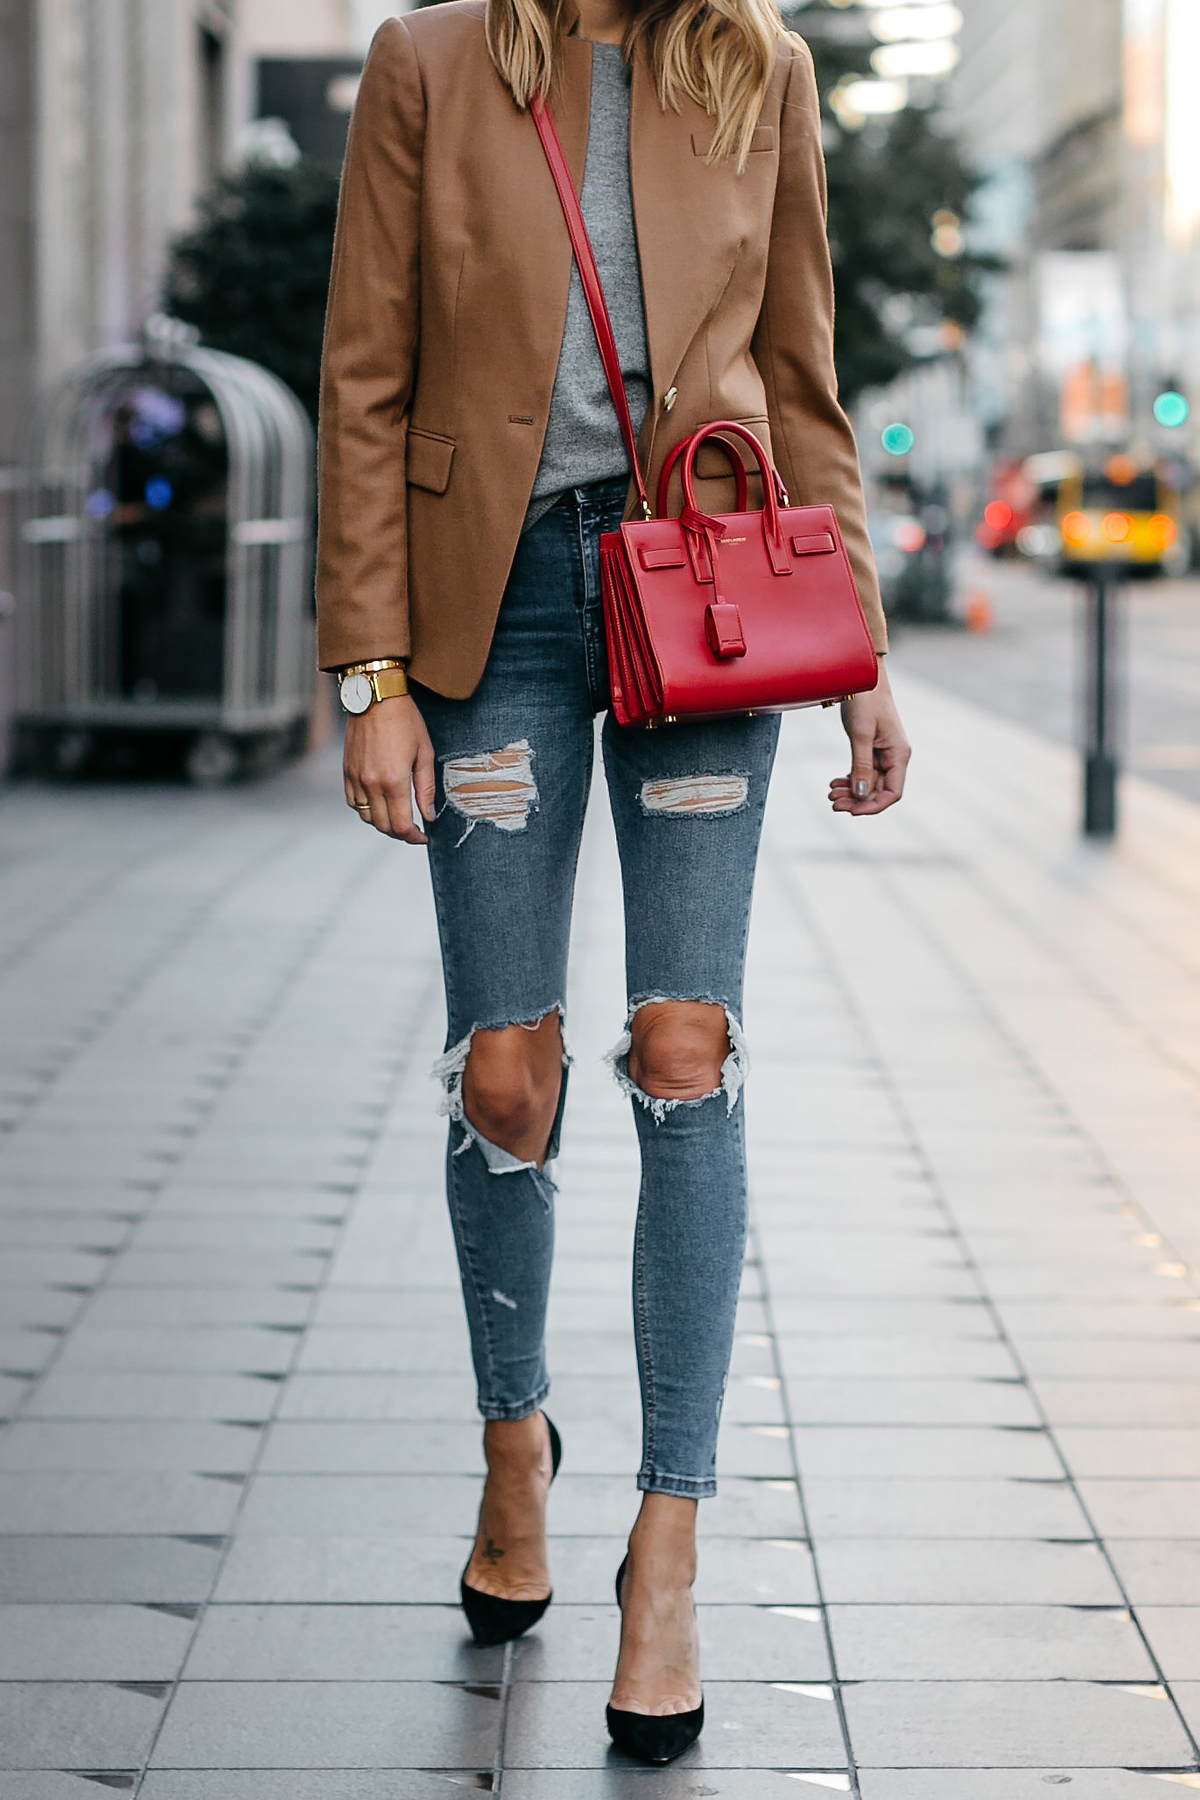 Jcrew Camel Blazer Grey Sweater Ripped Denim Jeans Black Pumps Saint Laurent Sac De Jour Nano Red Bag Fashion Jackson Dallas Blogger Fashion Blogger Street Style